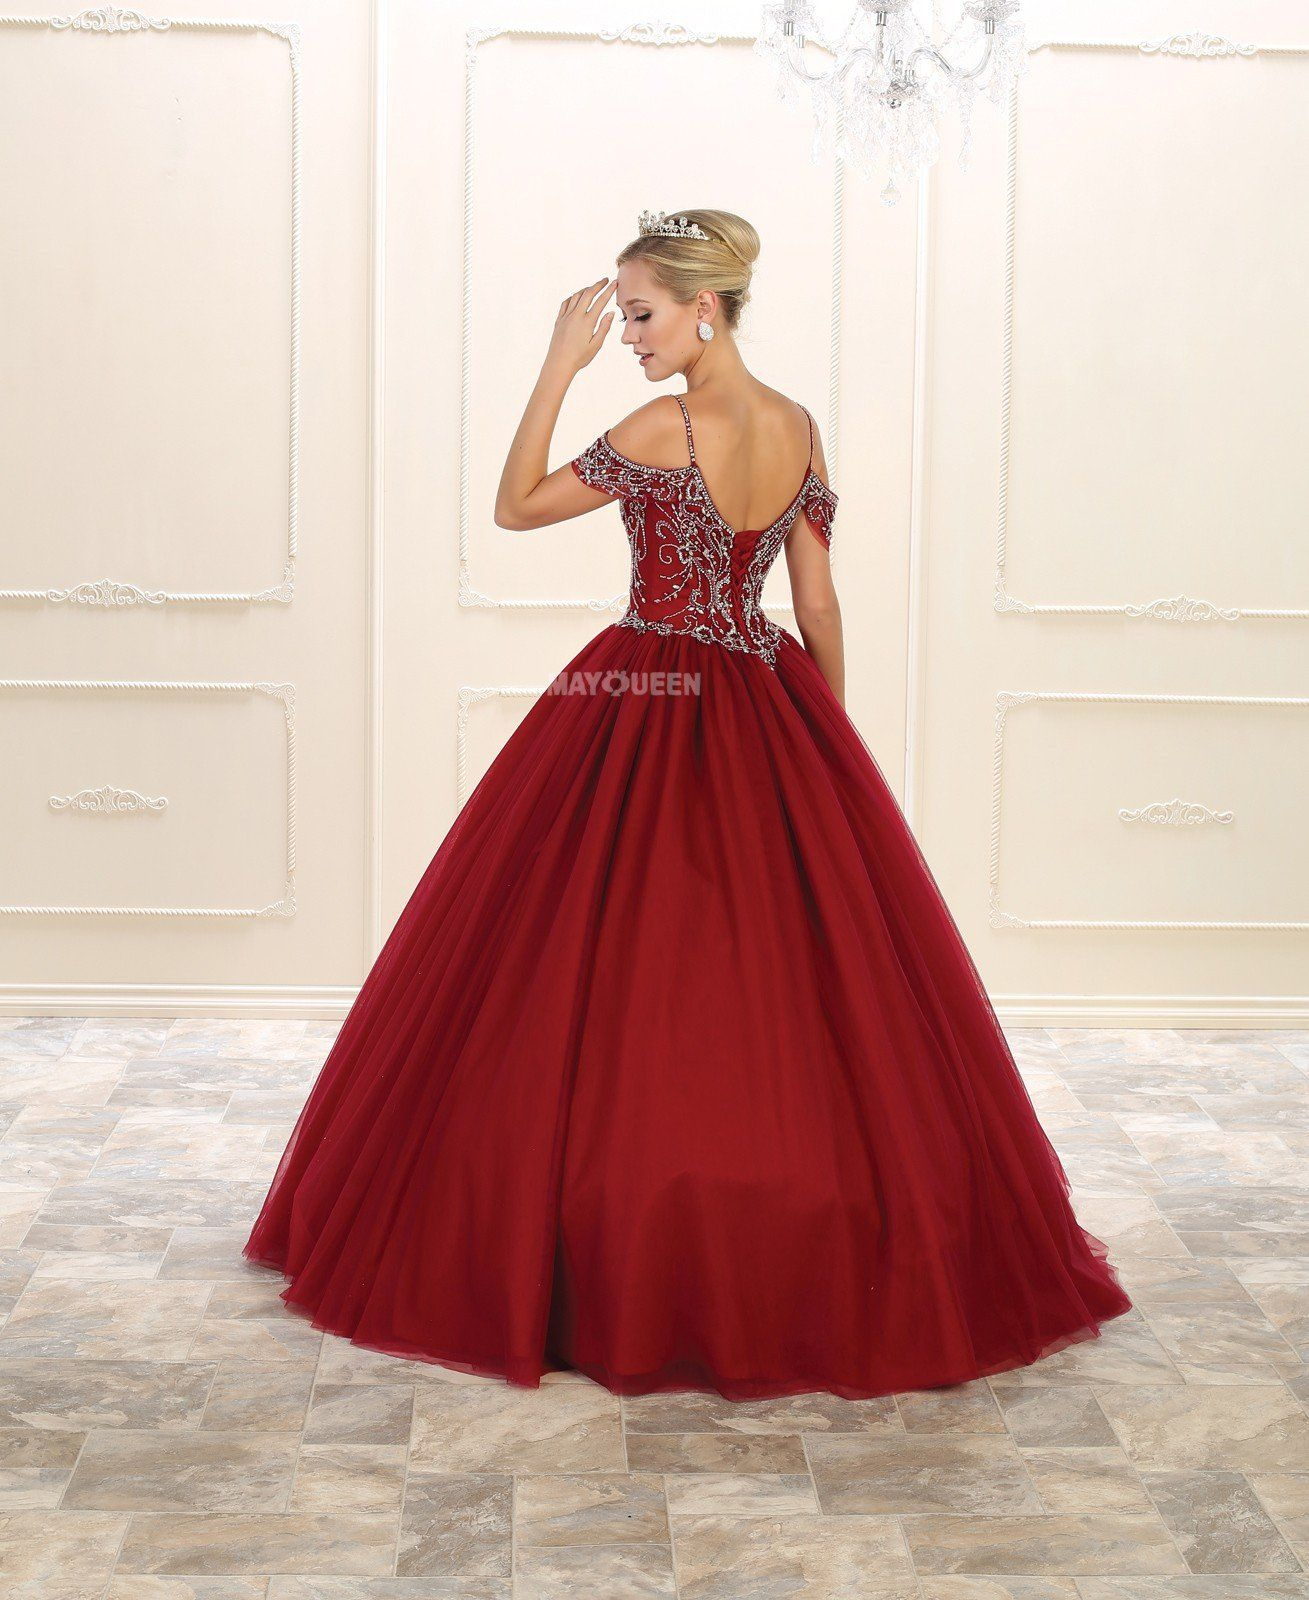 Mq lk off the shoulder sweetheart bead embellished corset tulle